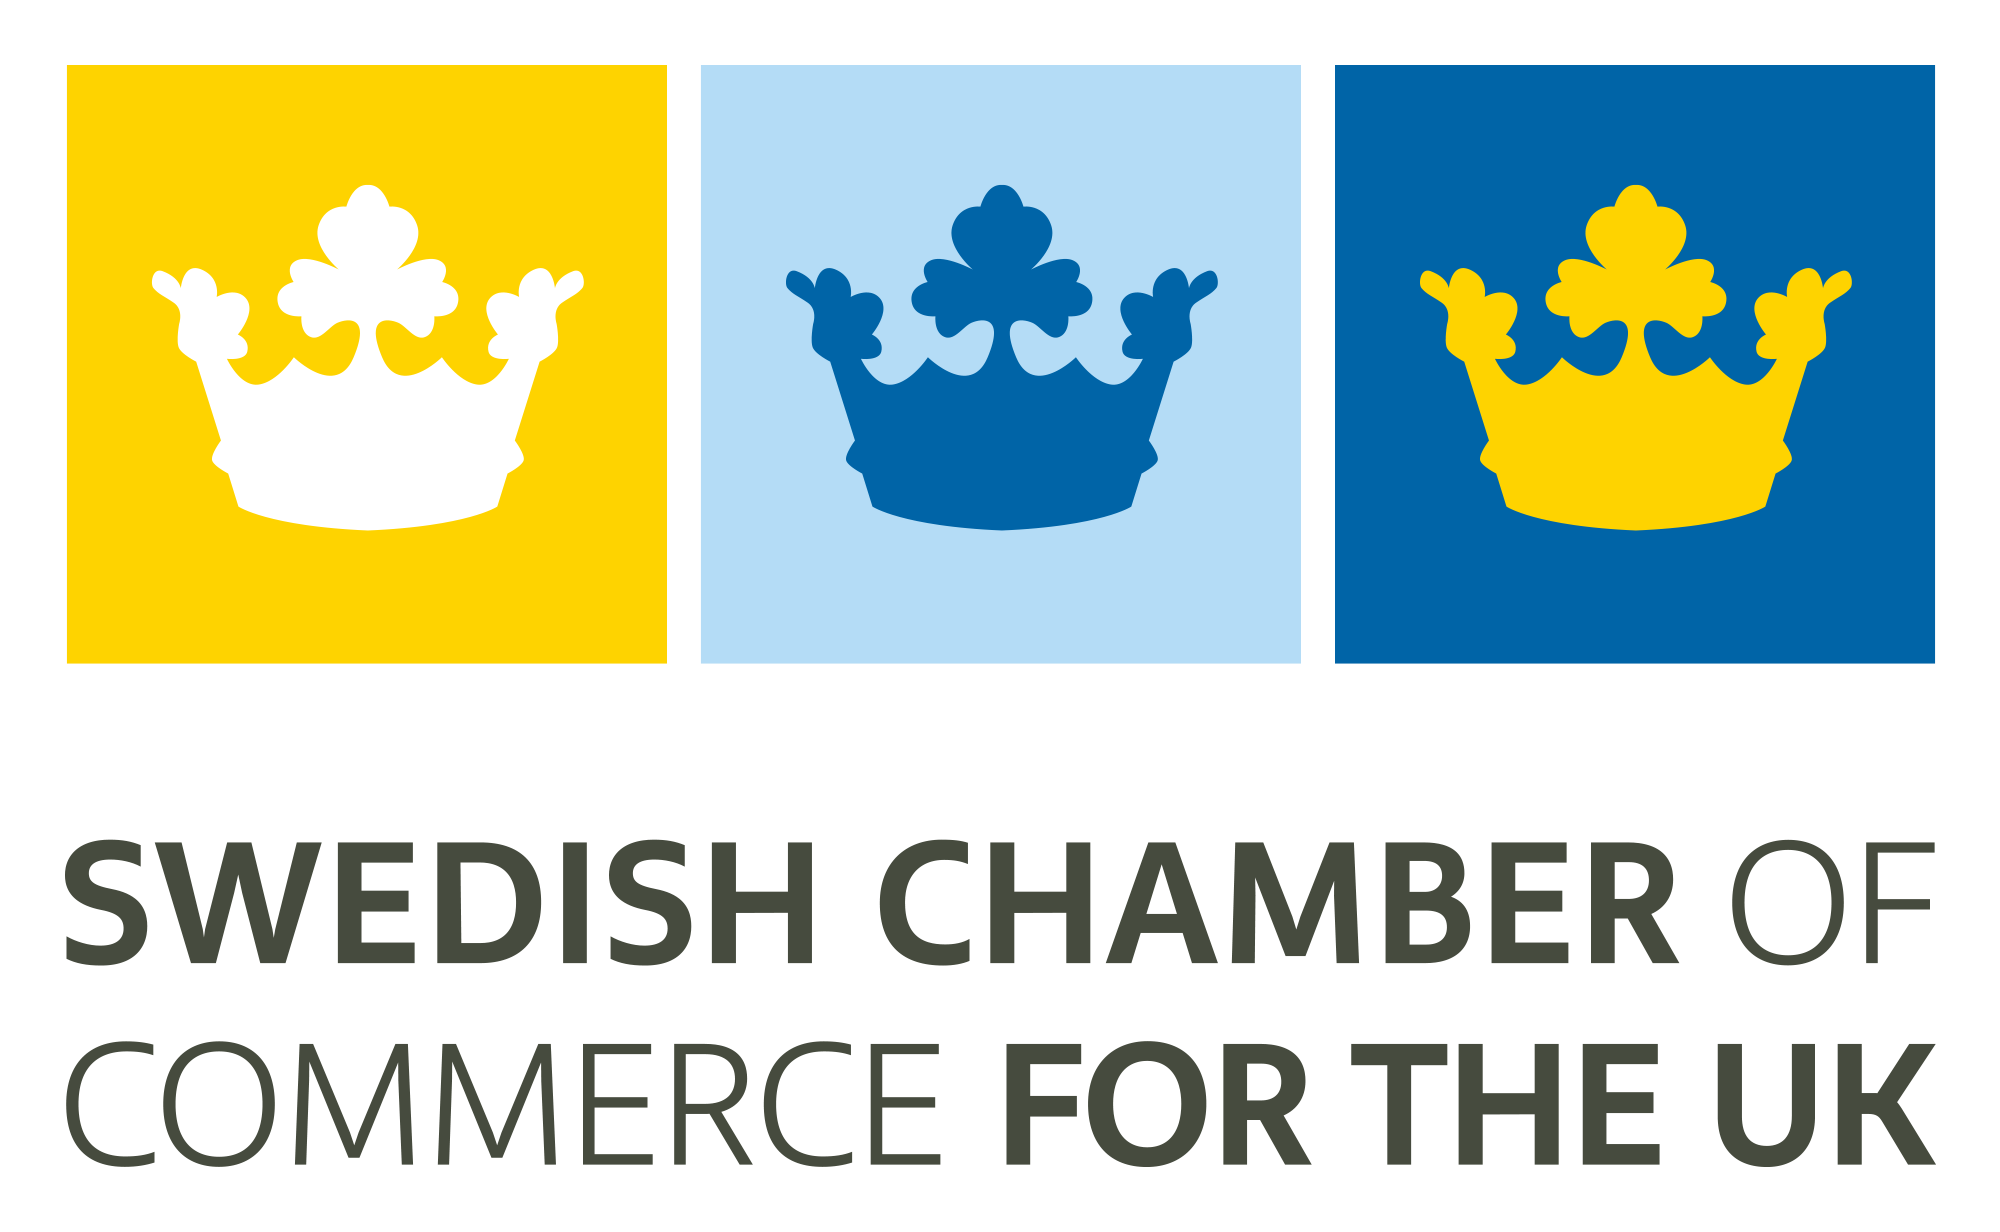 Swedish Chamber of Commerce UK